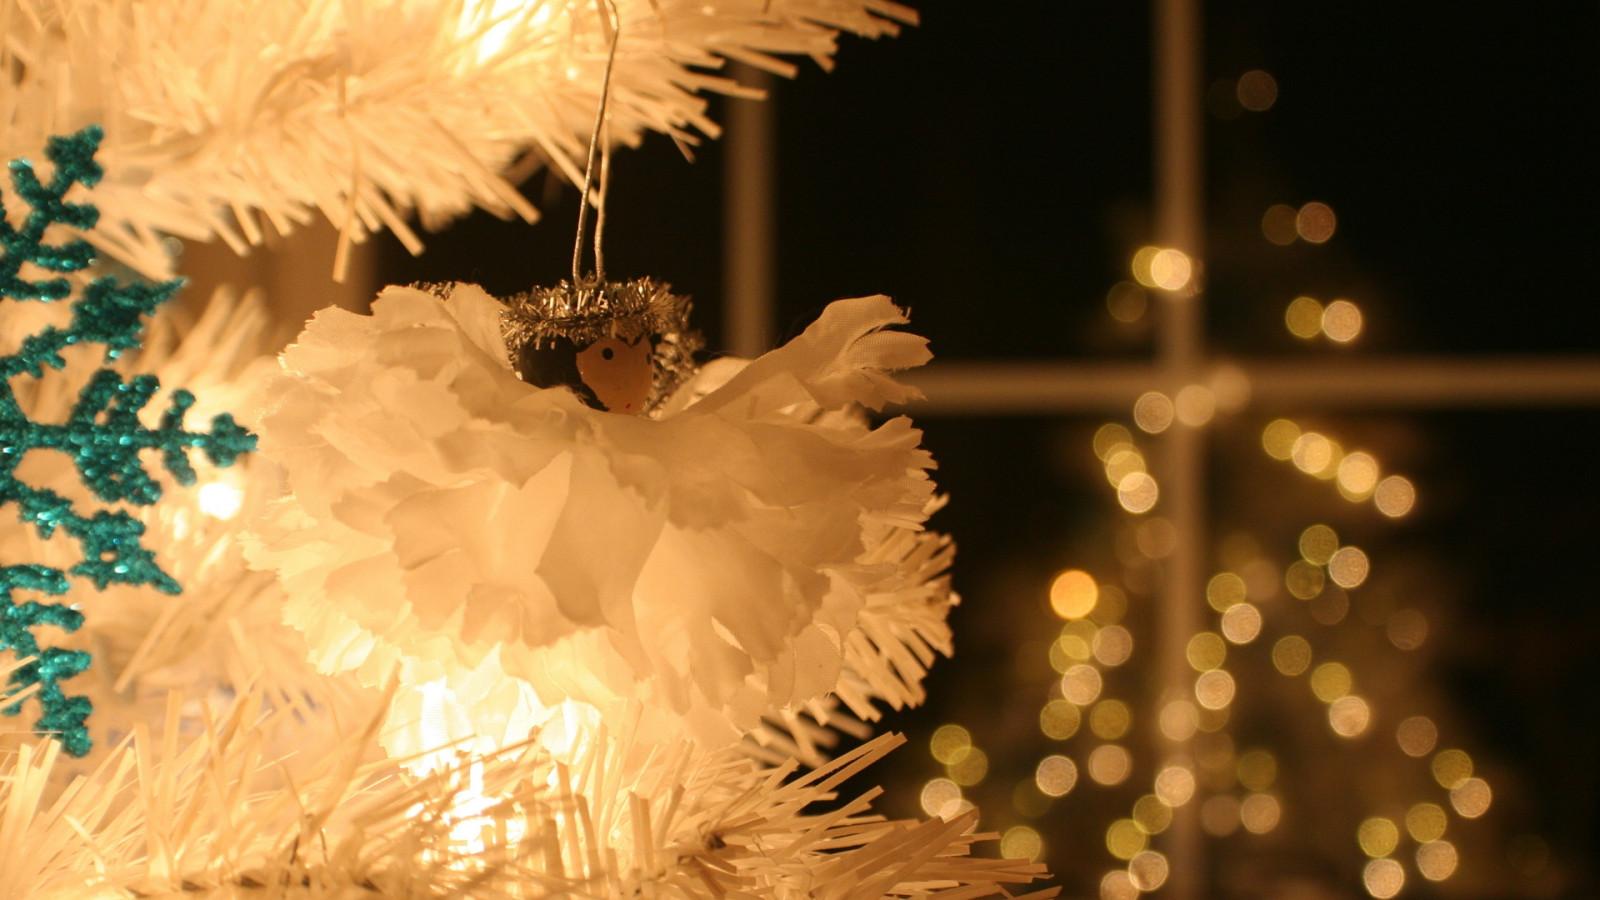 Fond D écran Vacances De Noël: Fond D'écran : Nuit, Cierge Magique, Arbre De Noël